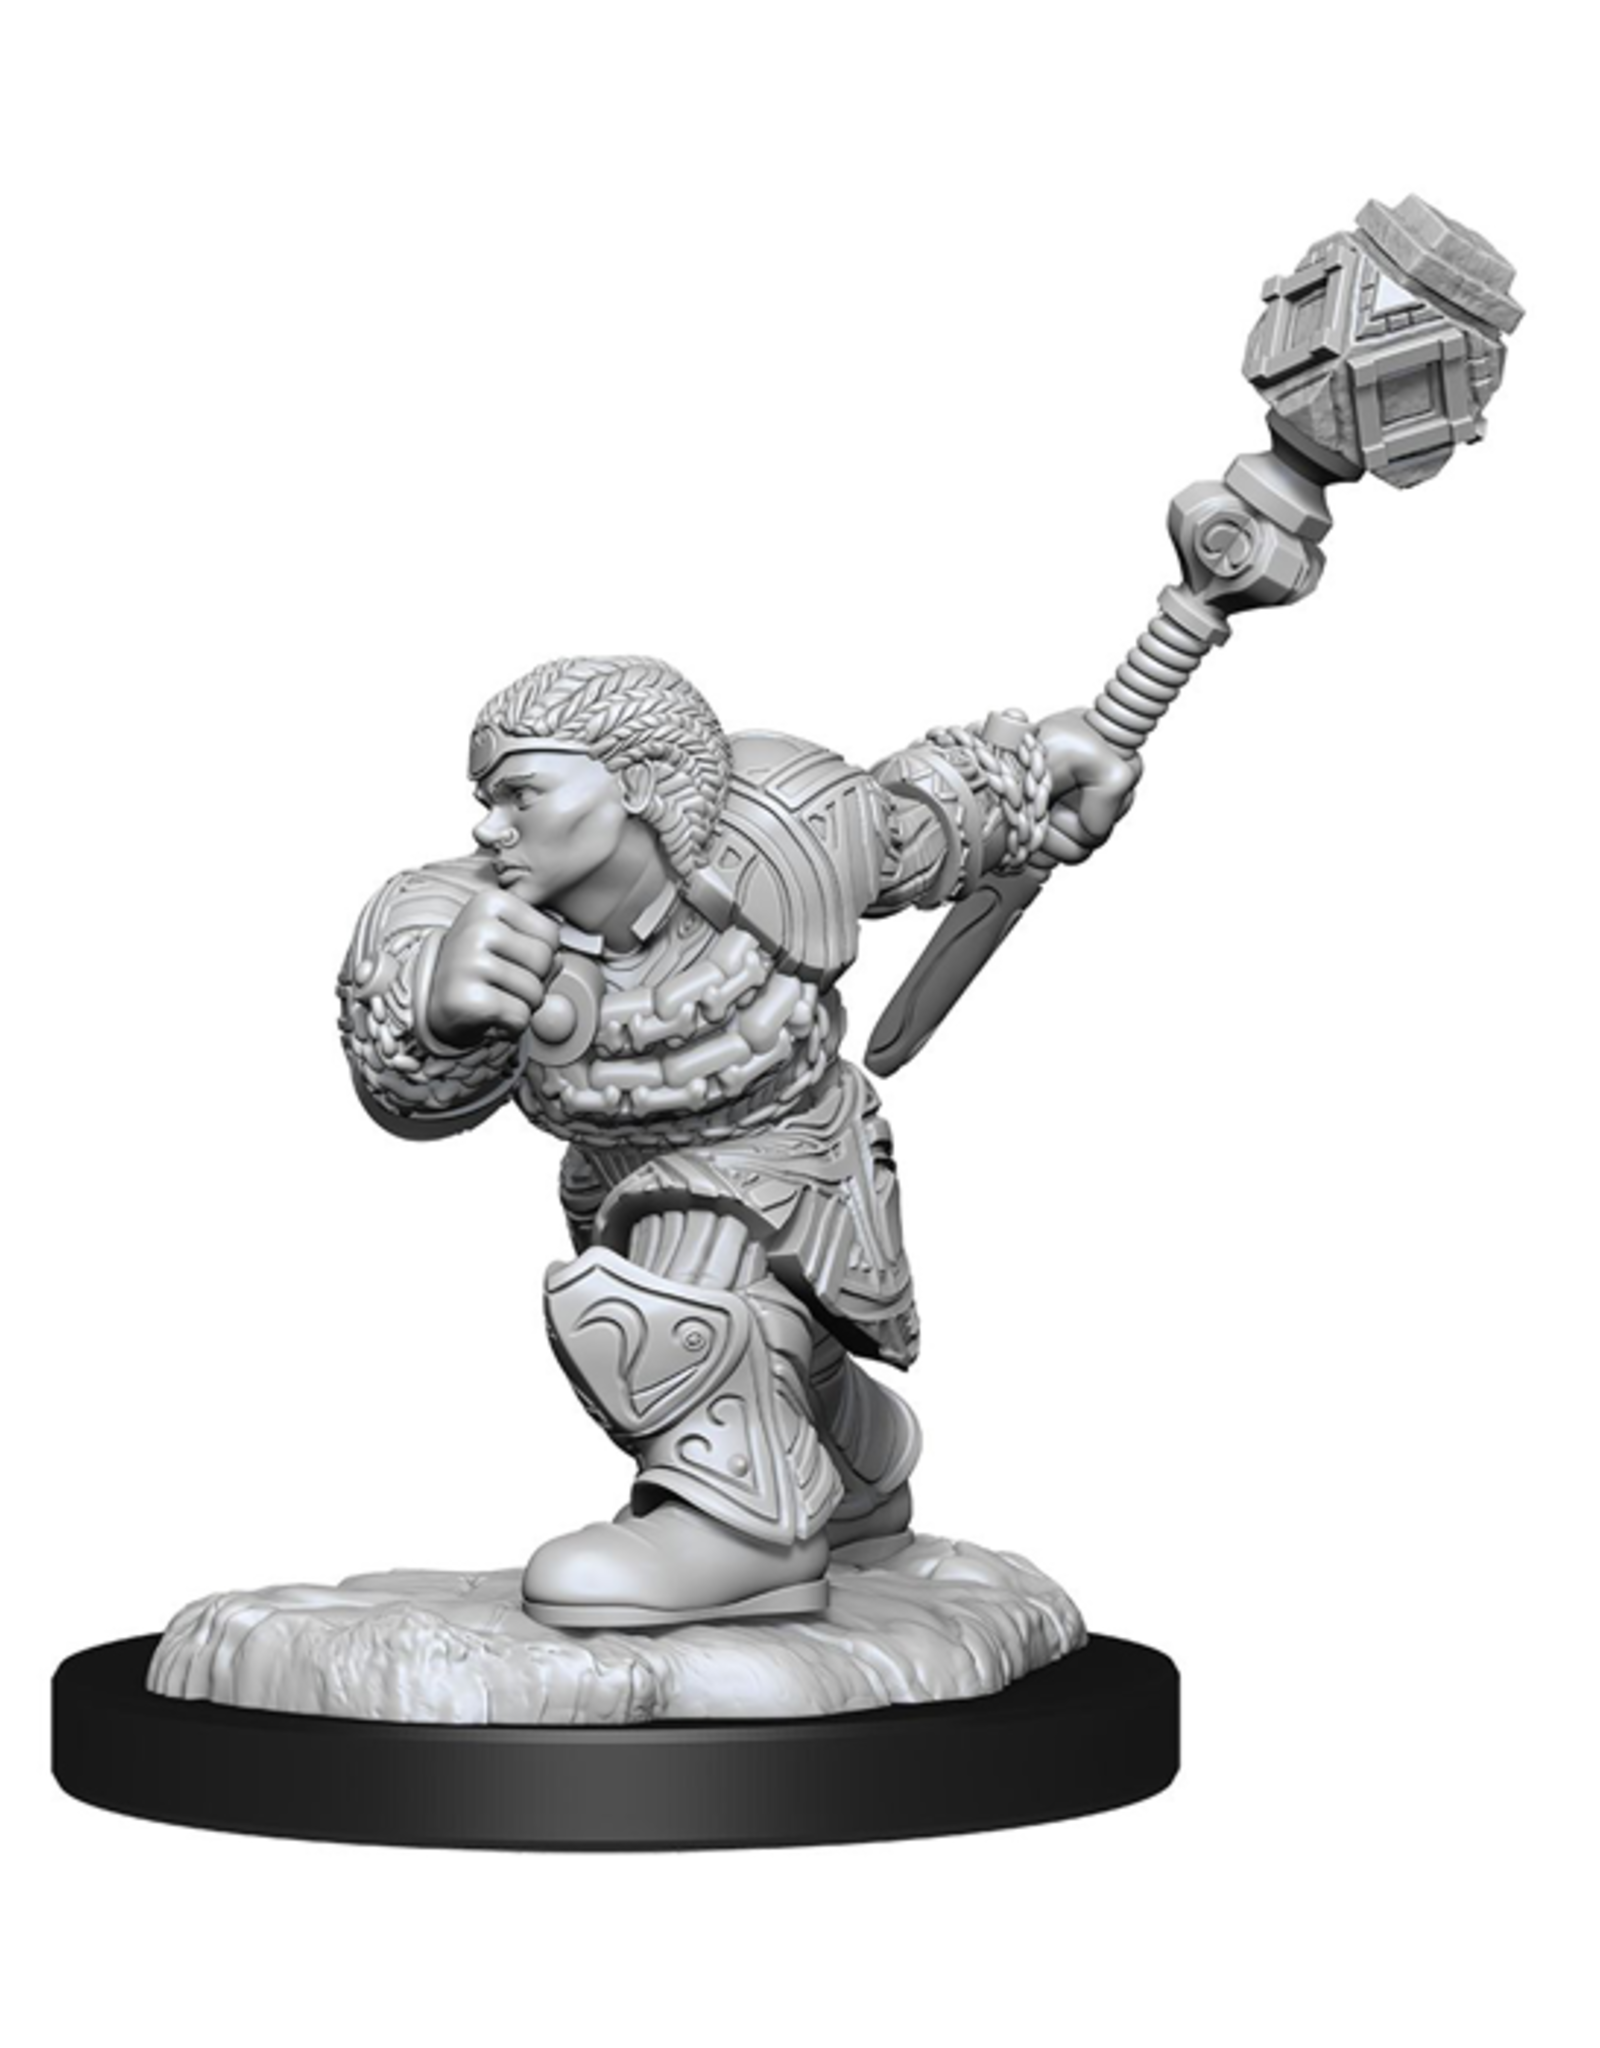 WizKids Magic: The Gathering - Unpainted Miniatures - Dwarf Fighter & Dwarf Cleric